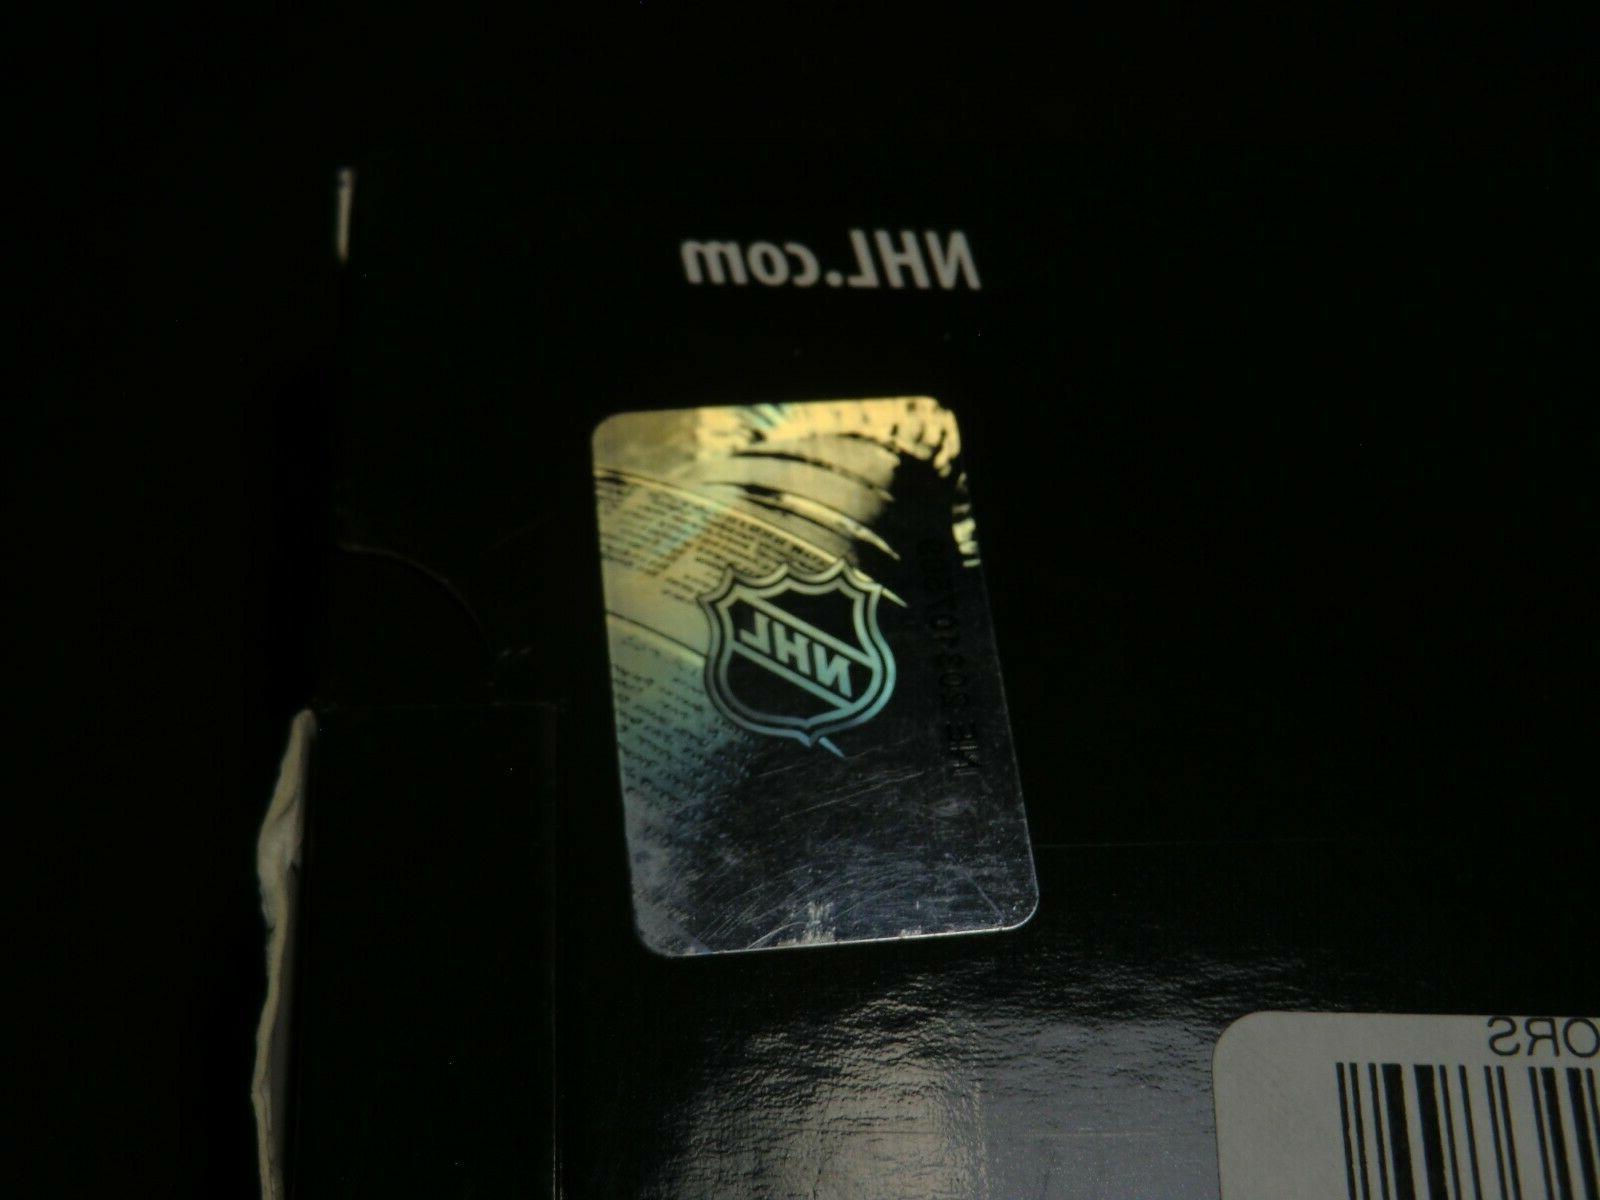 NHL Ottawa Stainless Steel Coasters